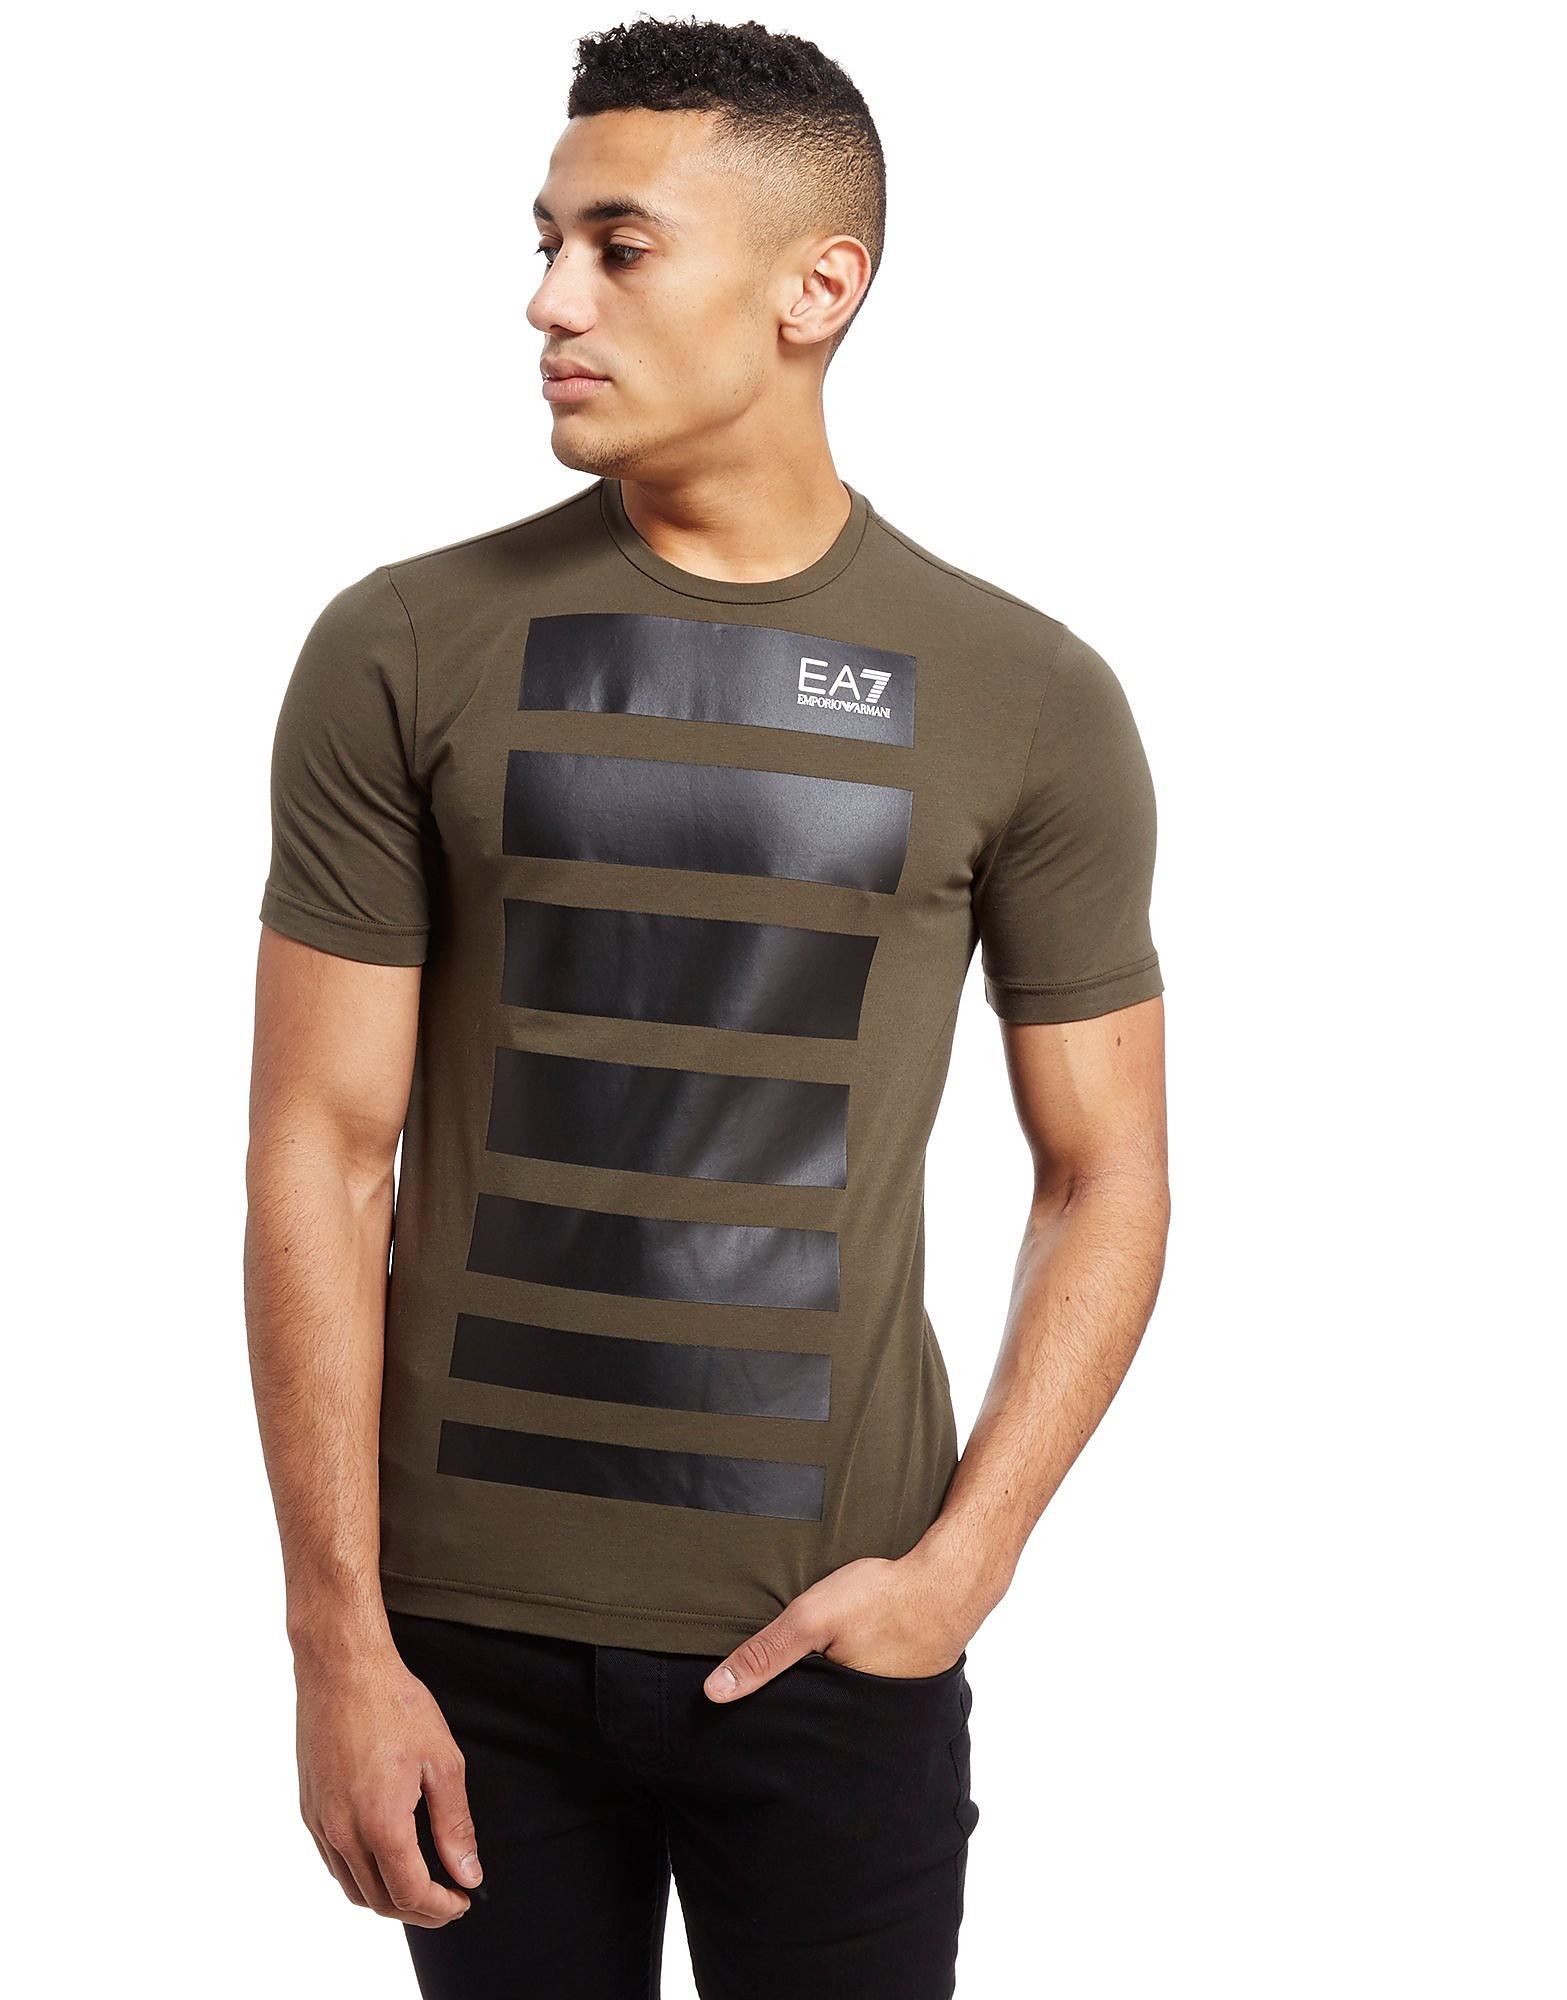 Emporio Armani EA7 7 Lines T-Shirt Homme